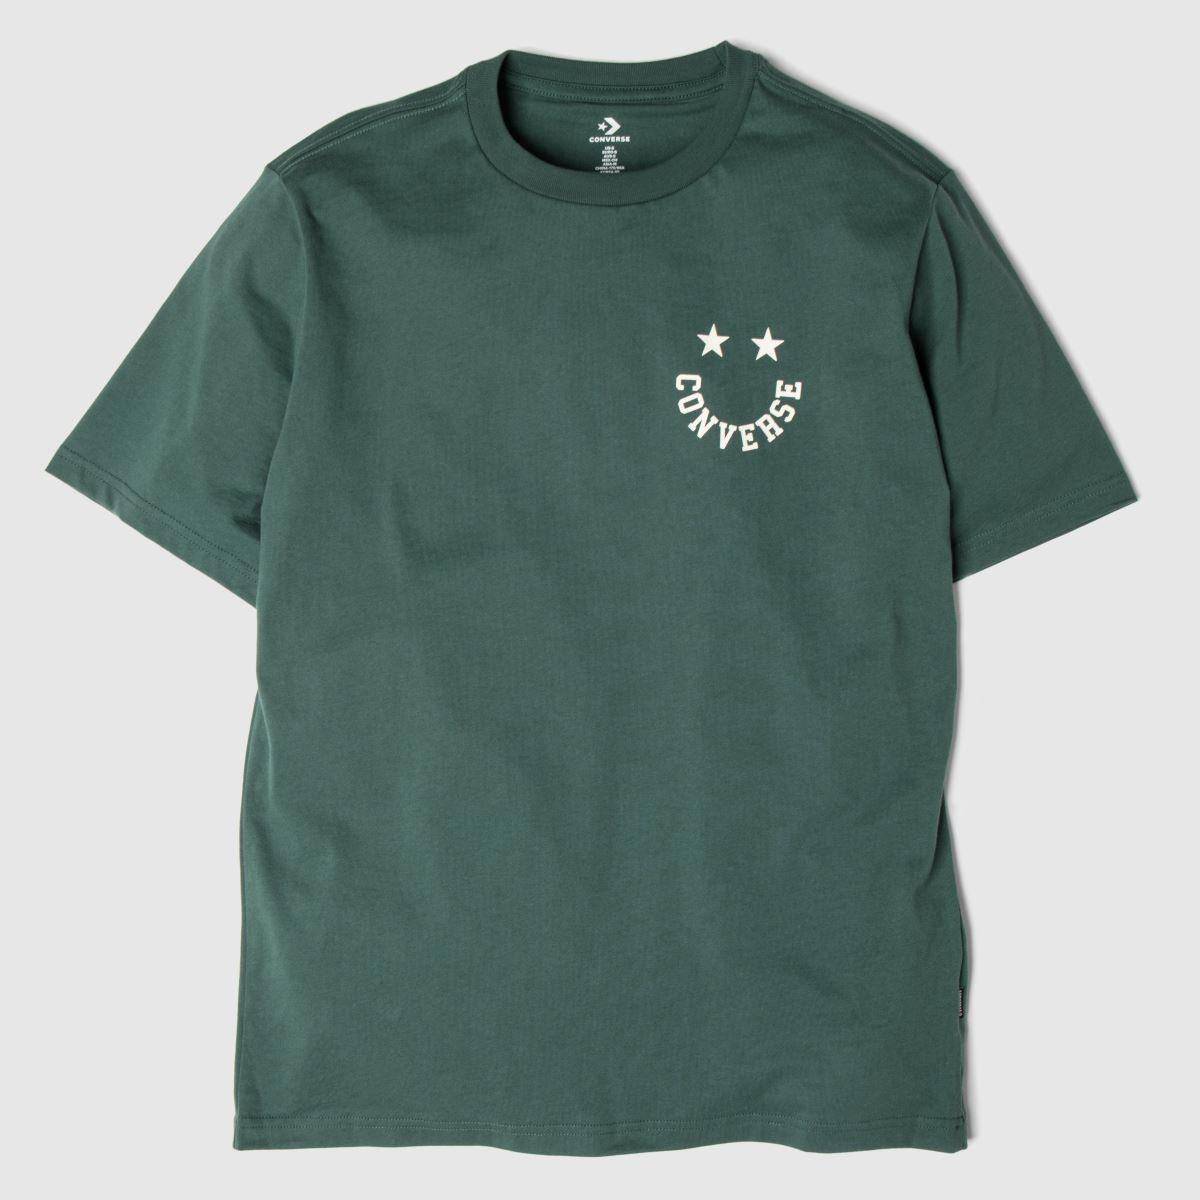 Converse Dark Green Happyface Graphic Tee